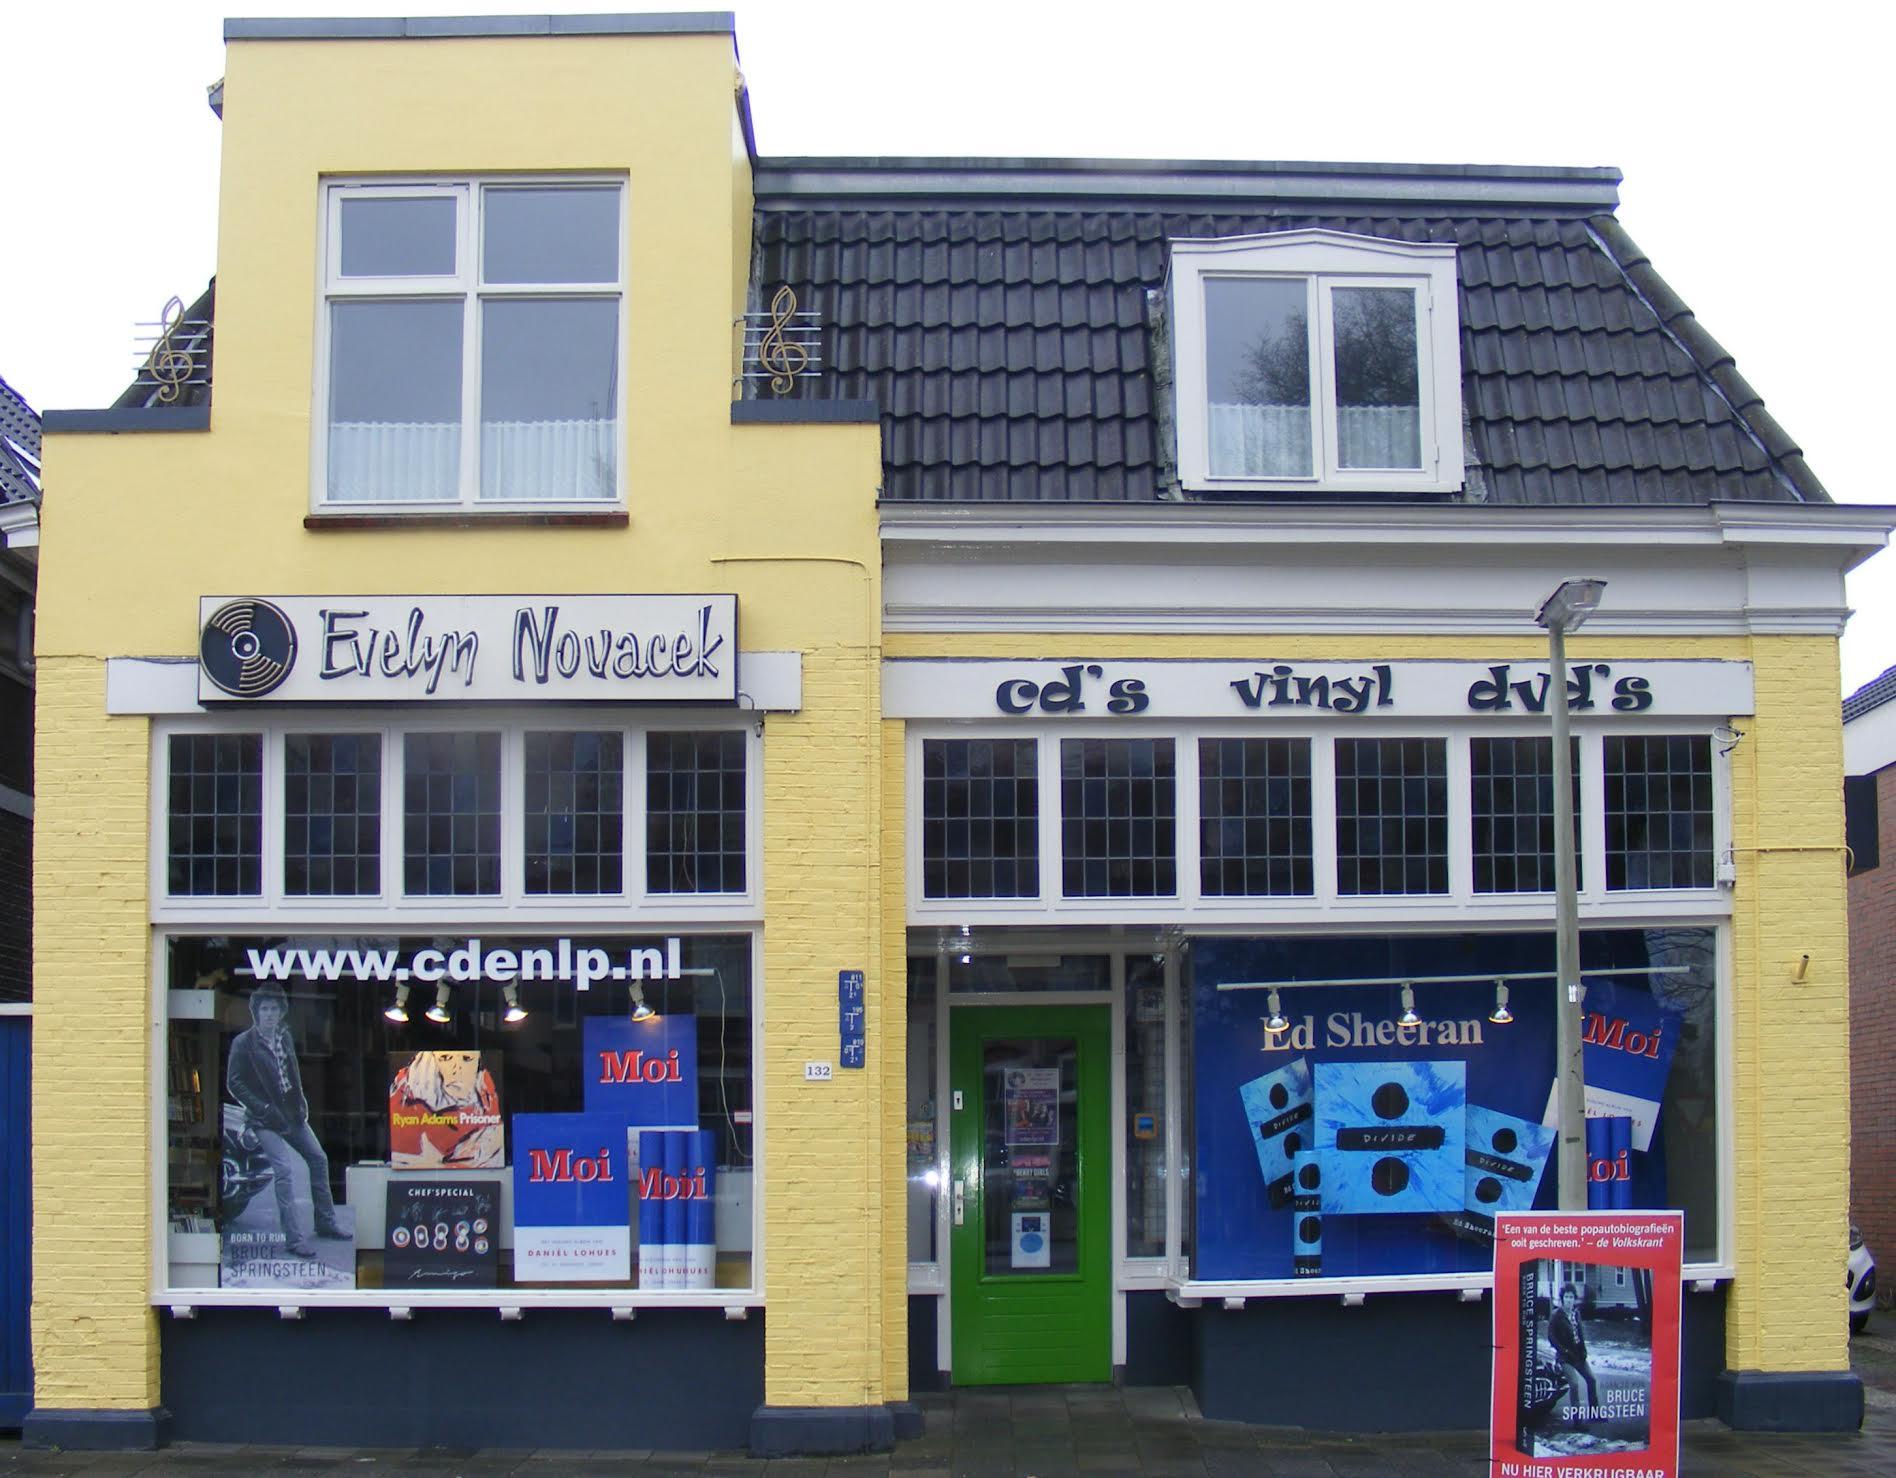 Evelyn Novacek store front